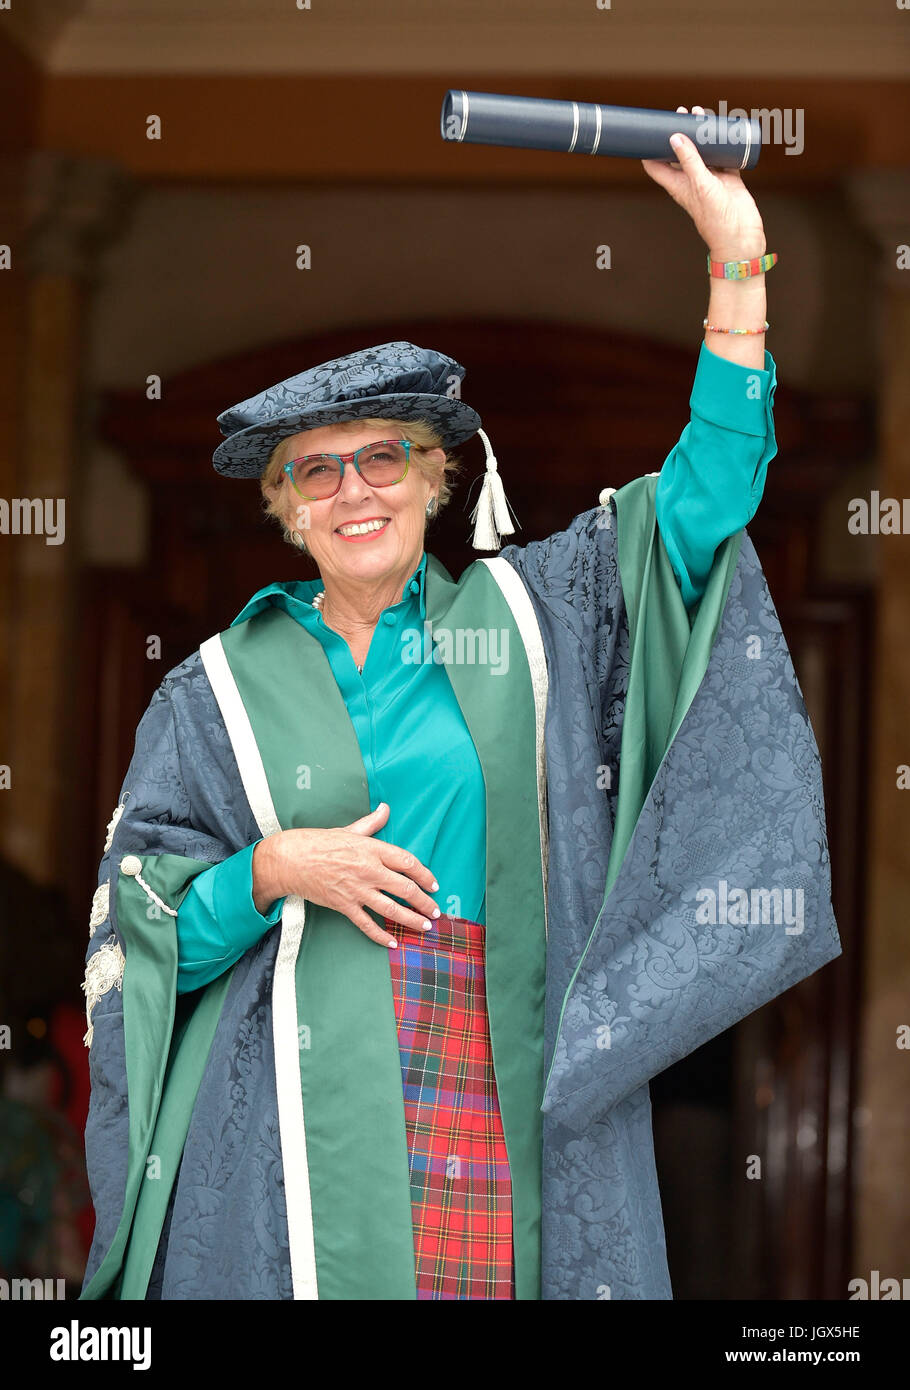 Edinburgh, UK. 11th Jul, 2017. Bake-Off judge installed as university chancellor and Hollywood film producer awarded - Stock Image